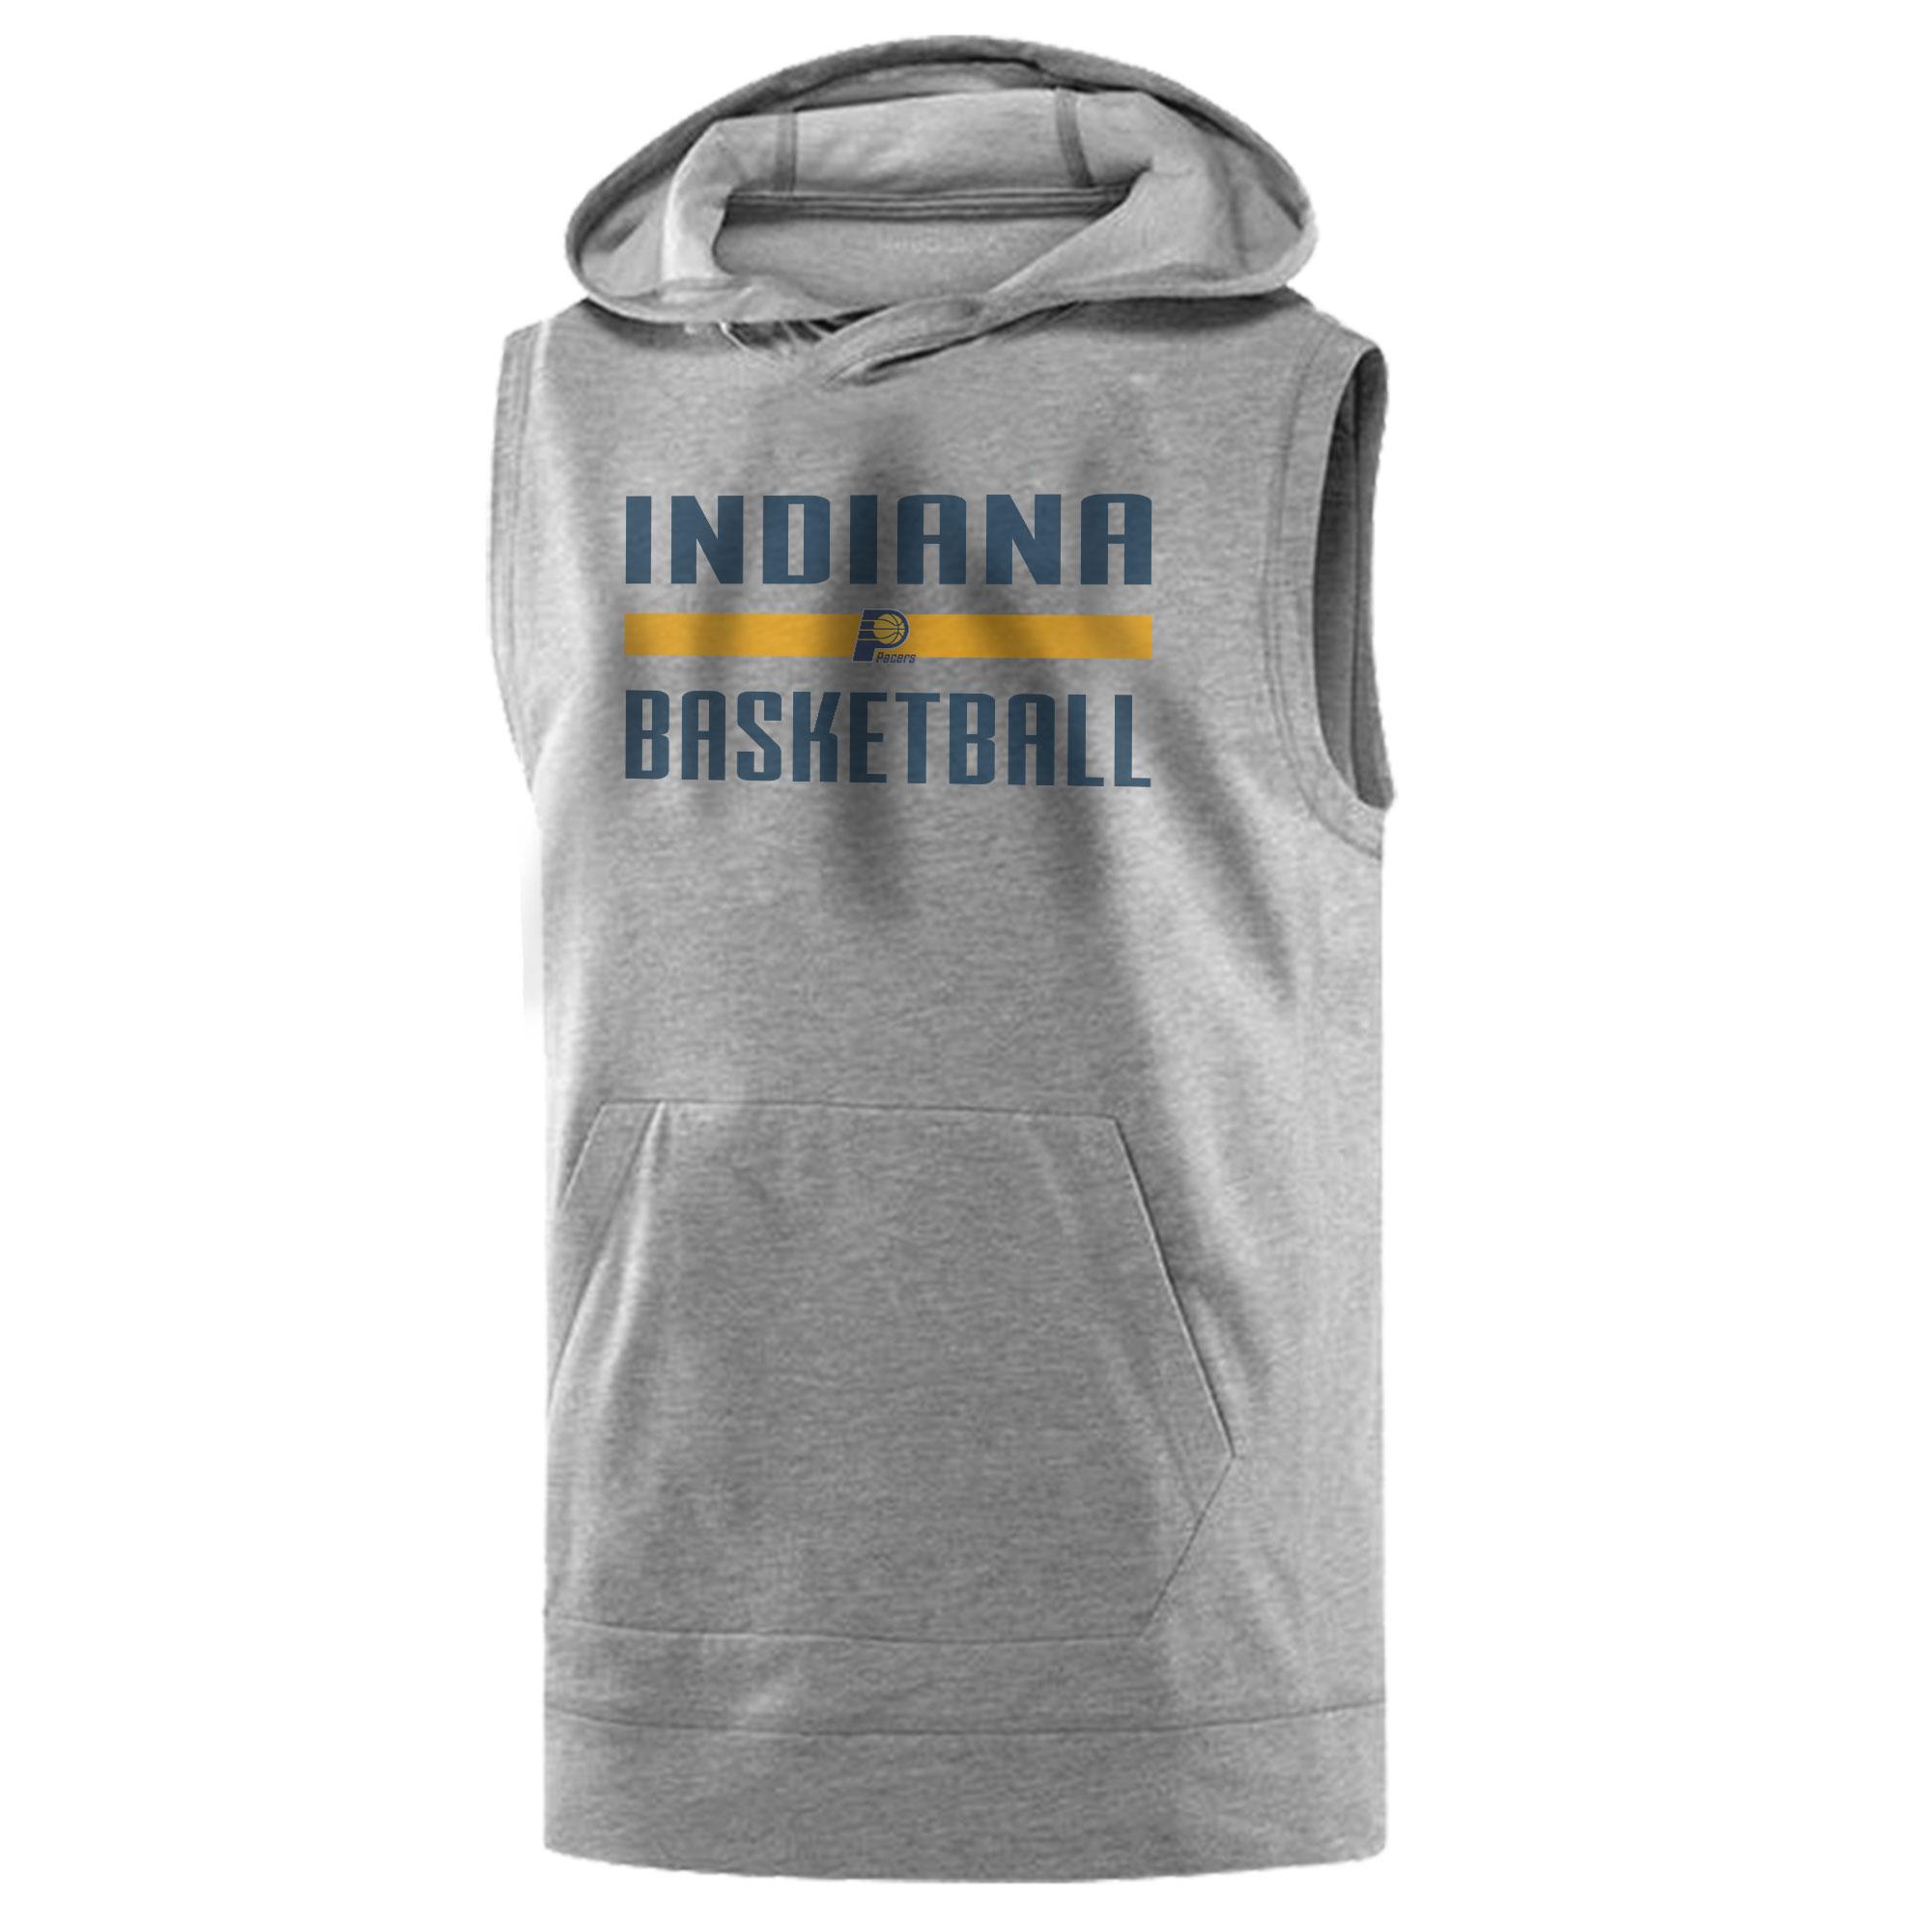 Indiana Basketball Sleeveless (KLS-GRY-NP-indiana-bsktbll-516)